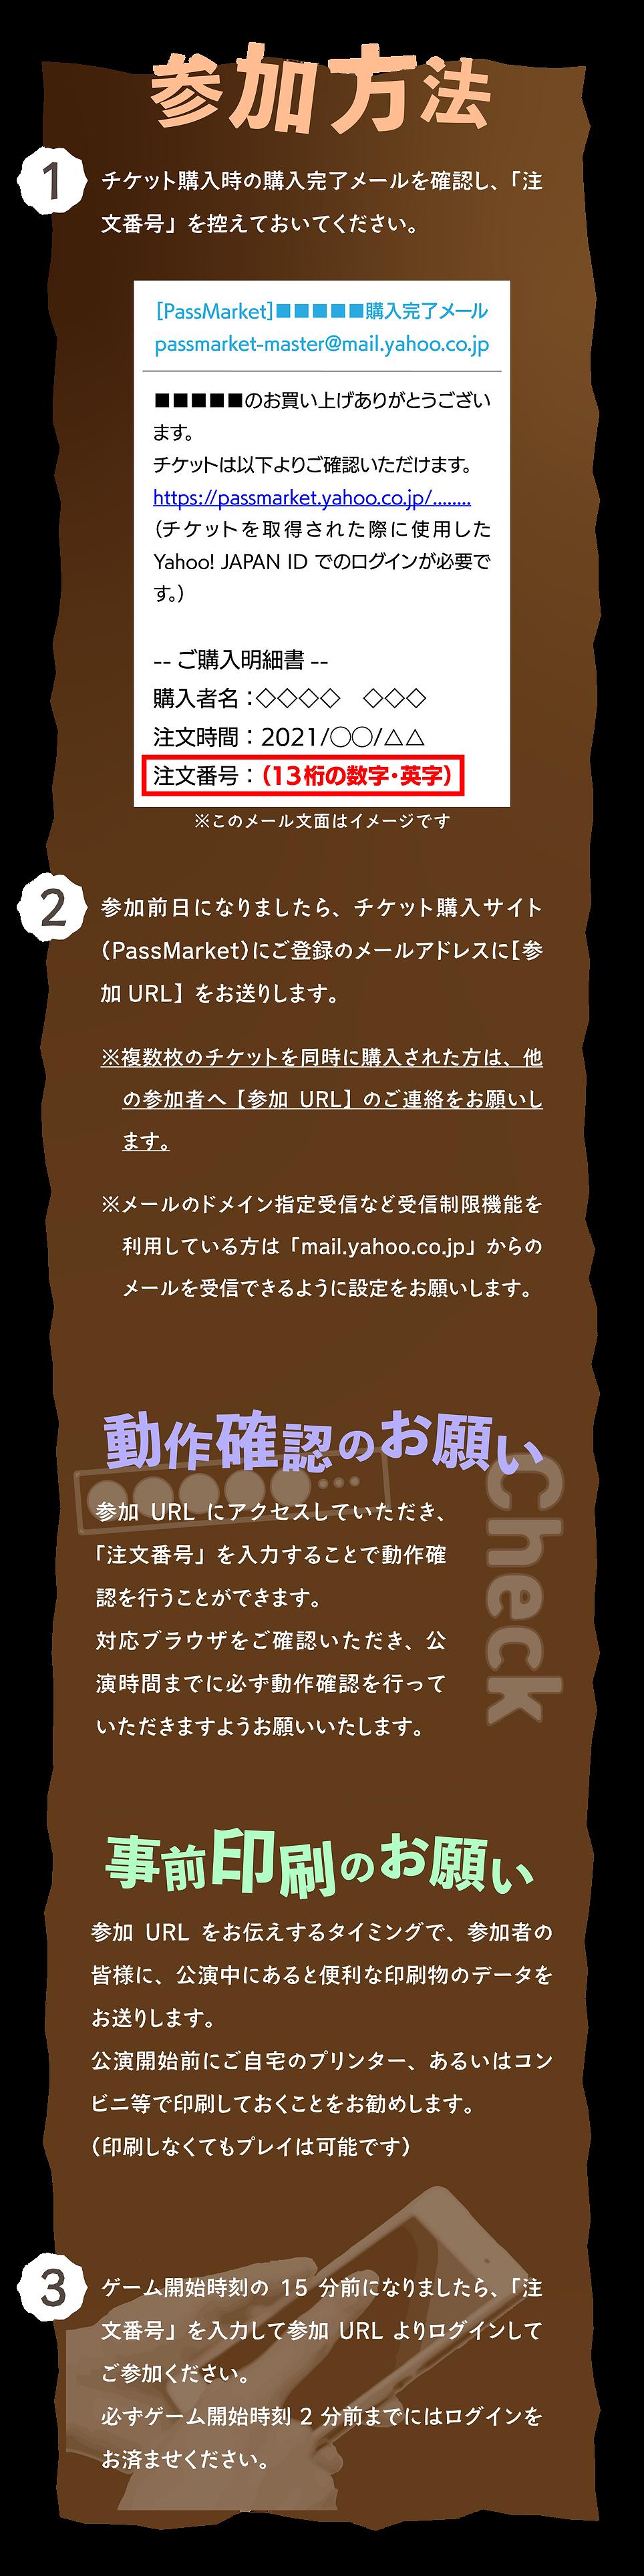 5_SDR_way.png